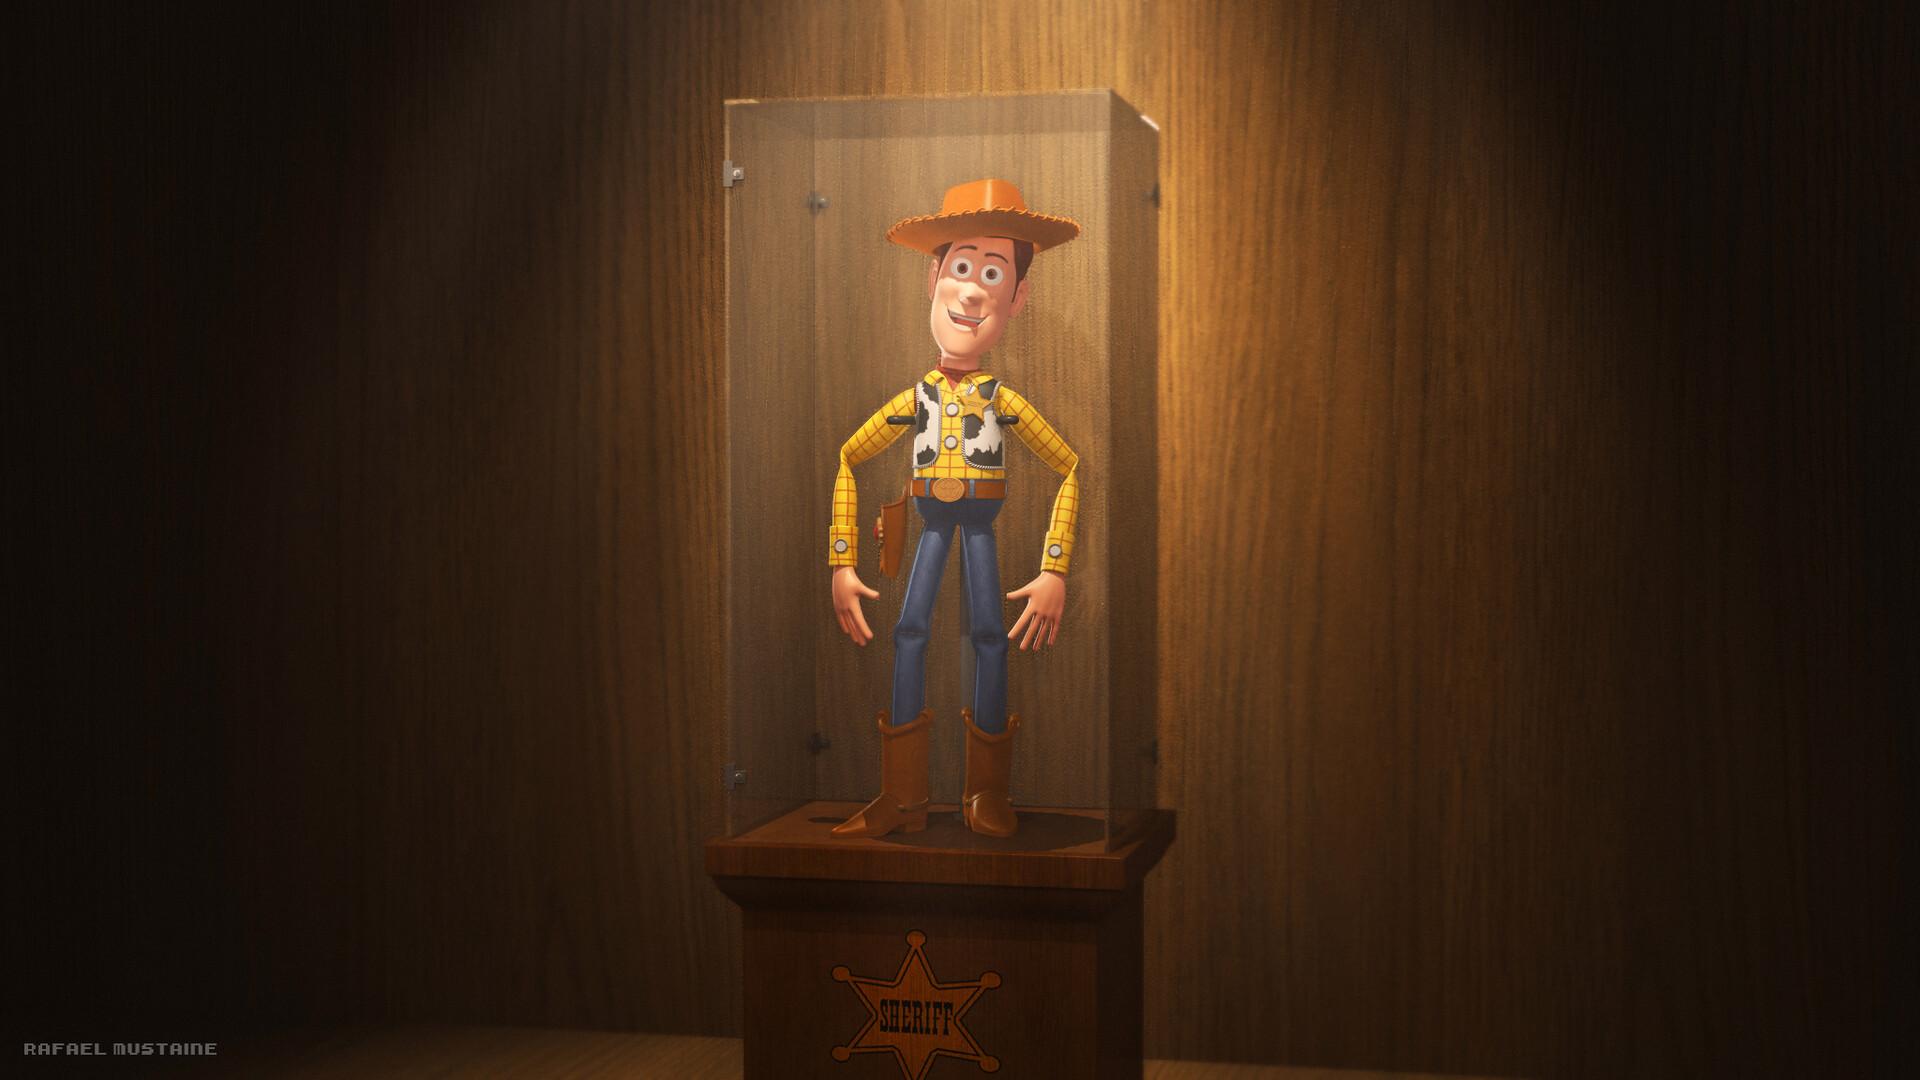 Rafael mustaine woodybyrm1